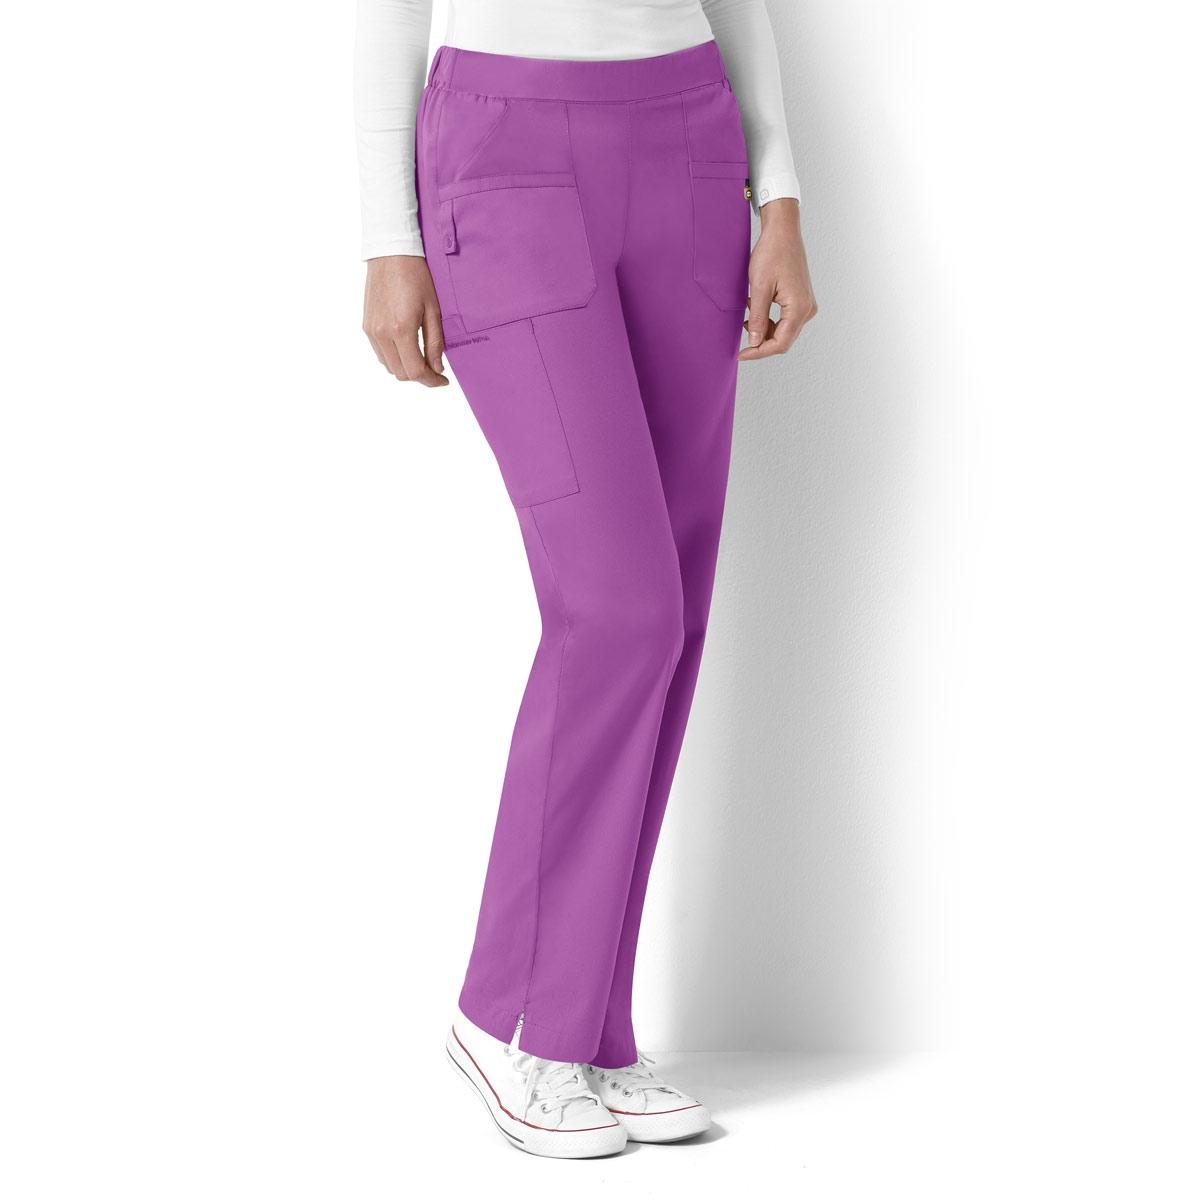 f0493ba46b2 Women's Next Madison Elastic Waistband Scrub Pants - WonderWink Scrubs